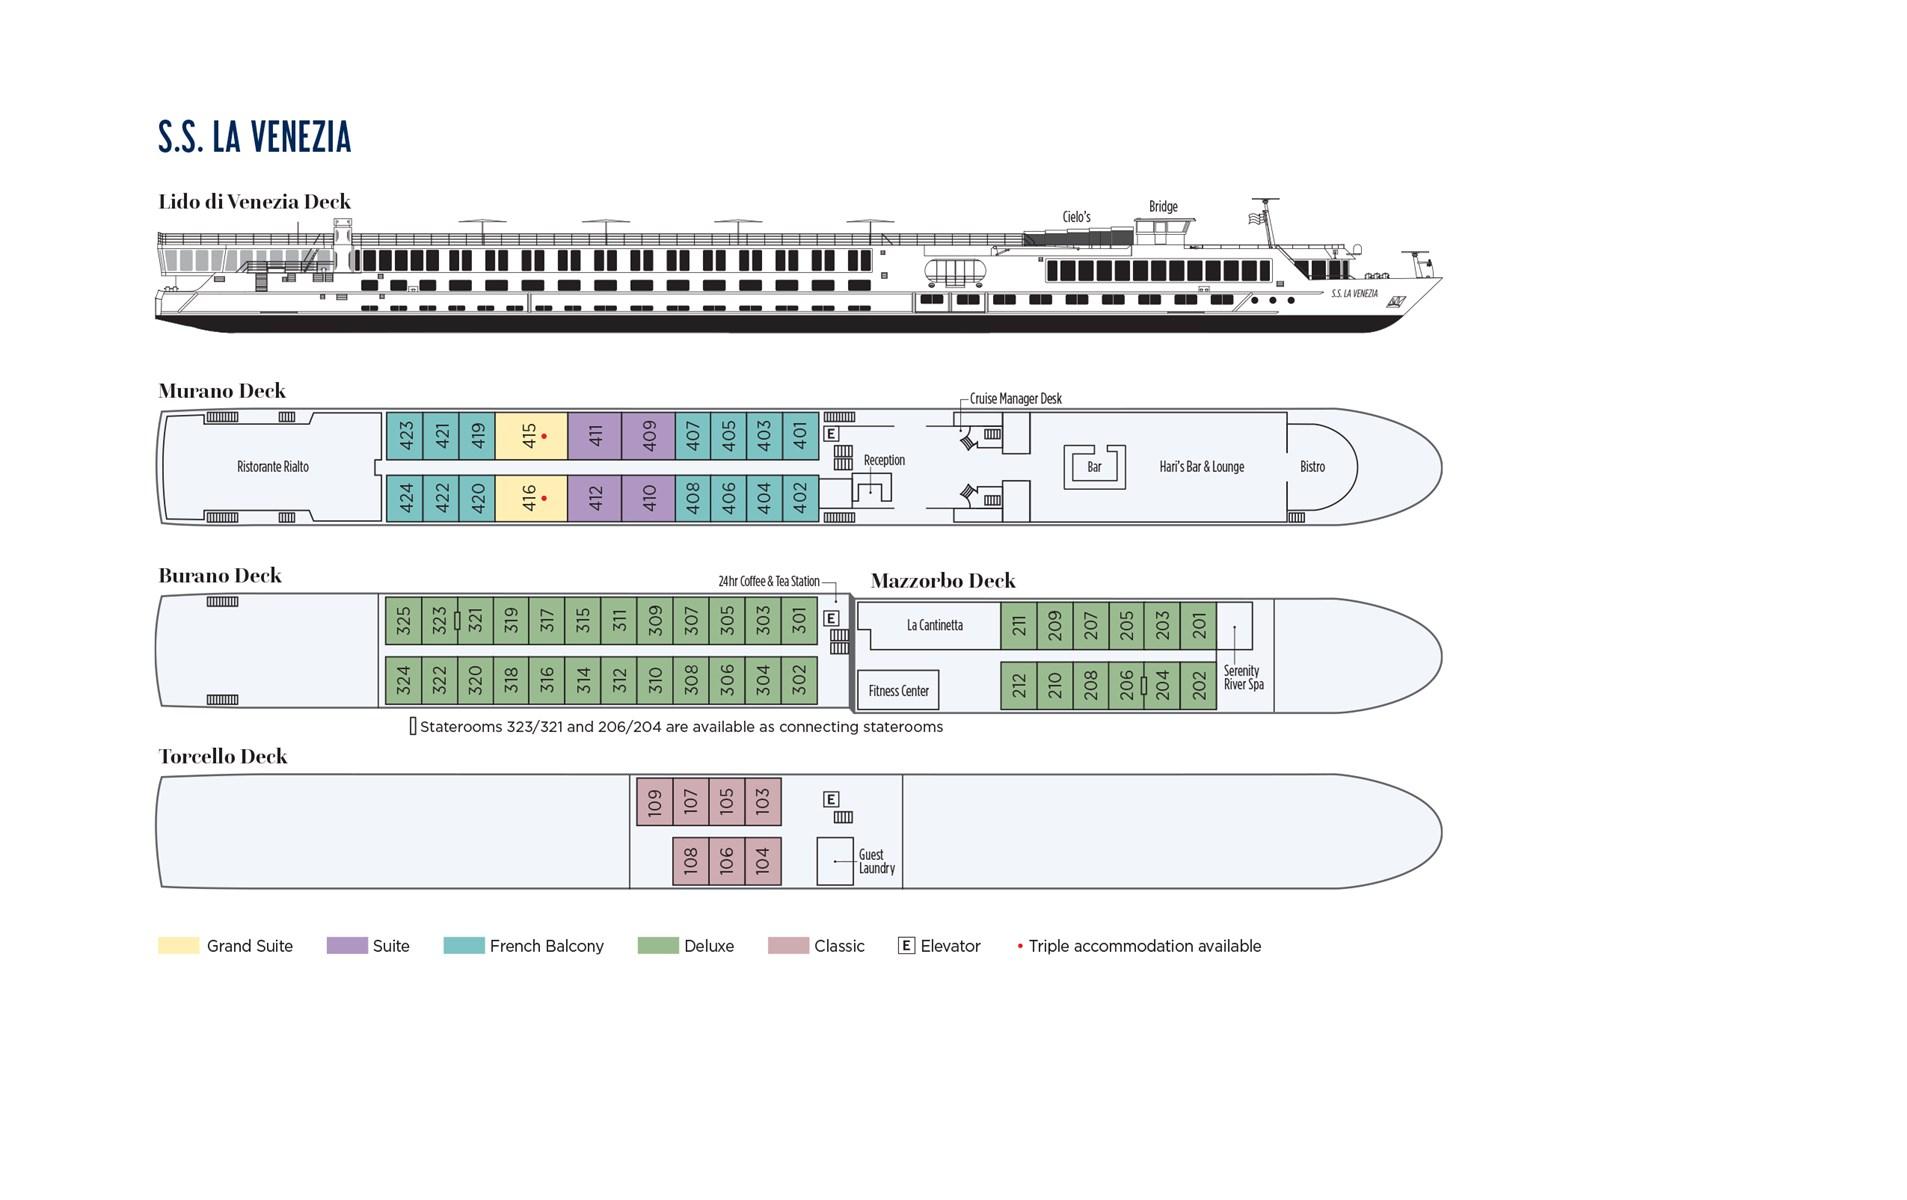 S.S. La Venezia Deck Plan